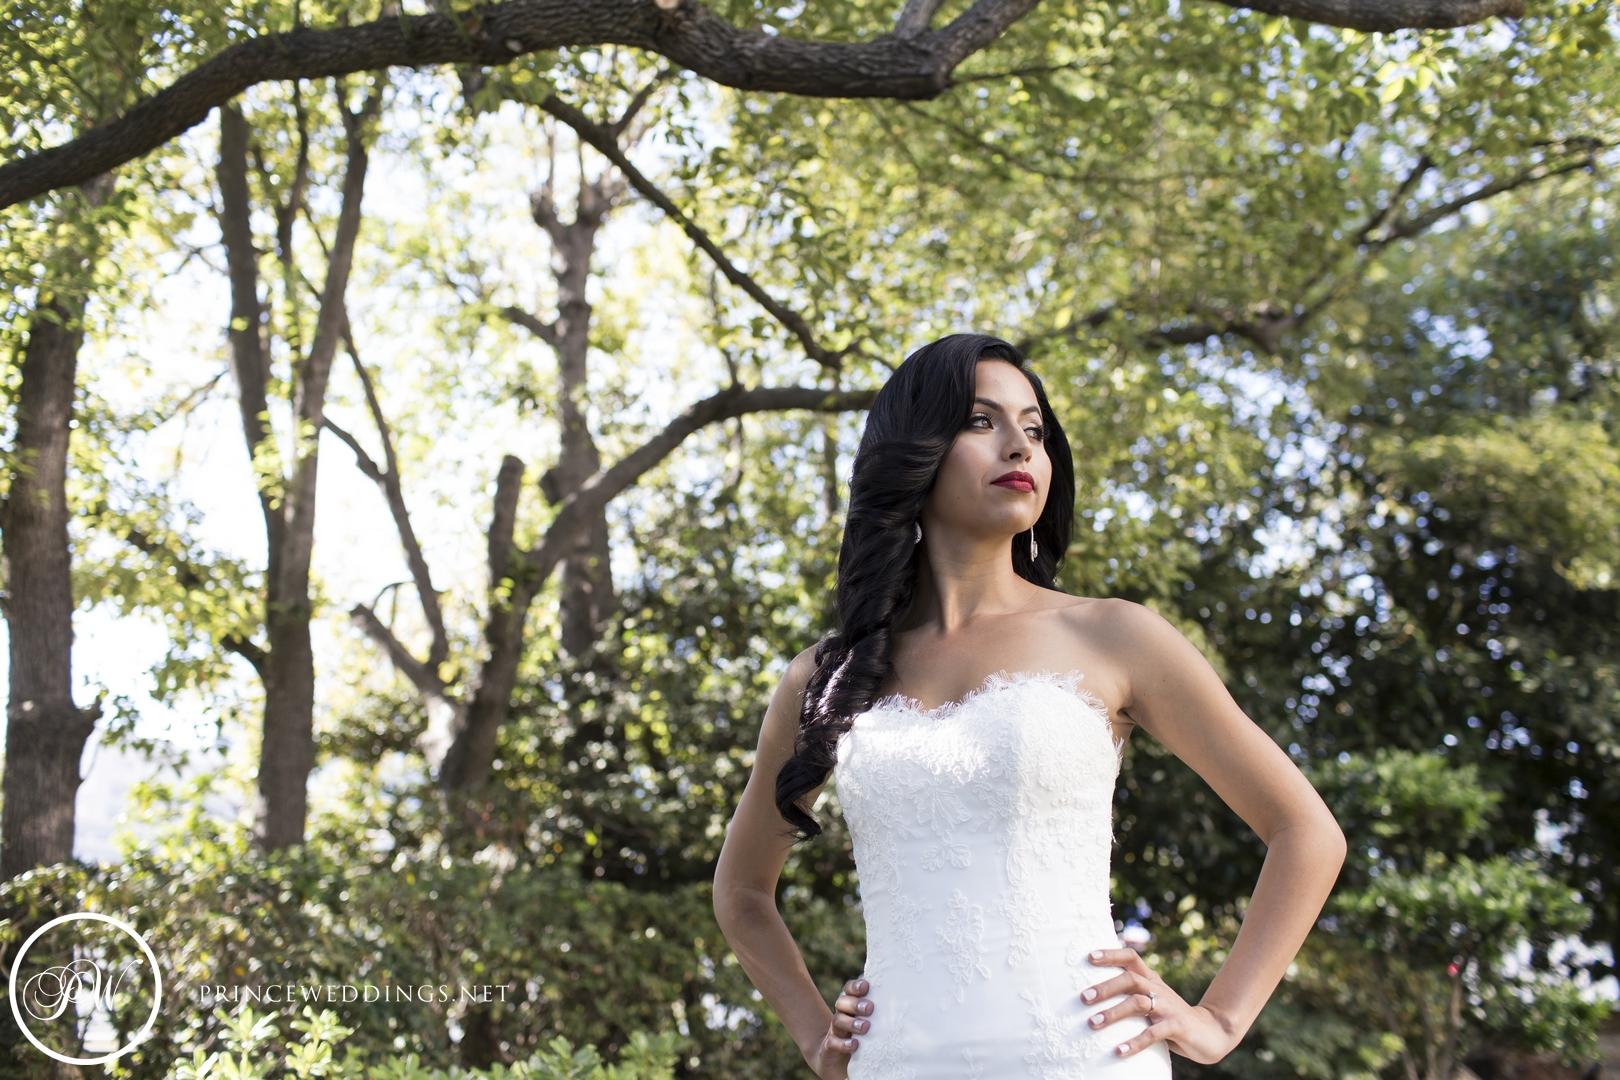 Los Angeles River Center & Gardens Wedding Photos-160.jpg